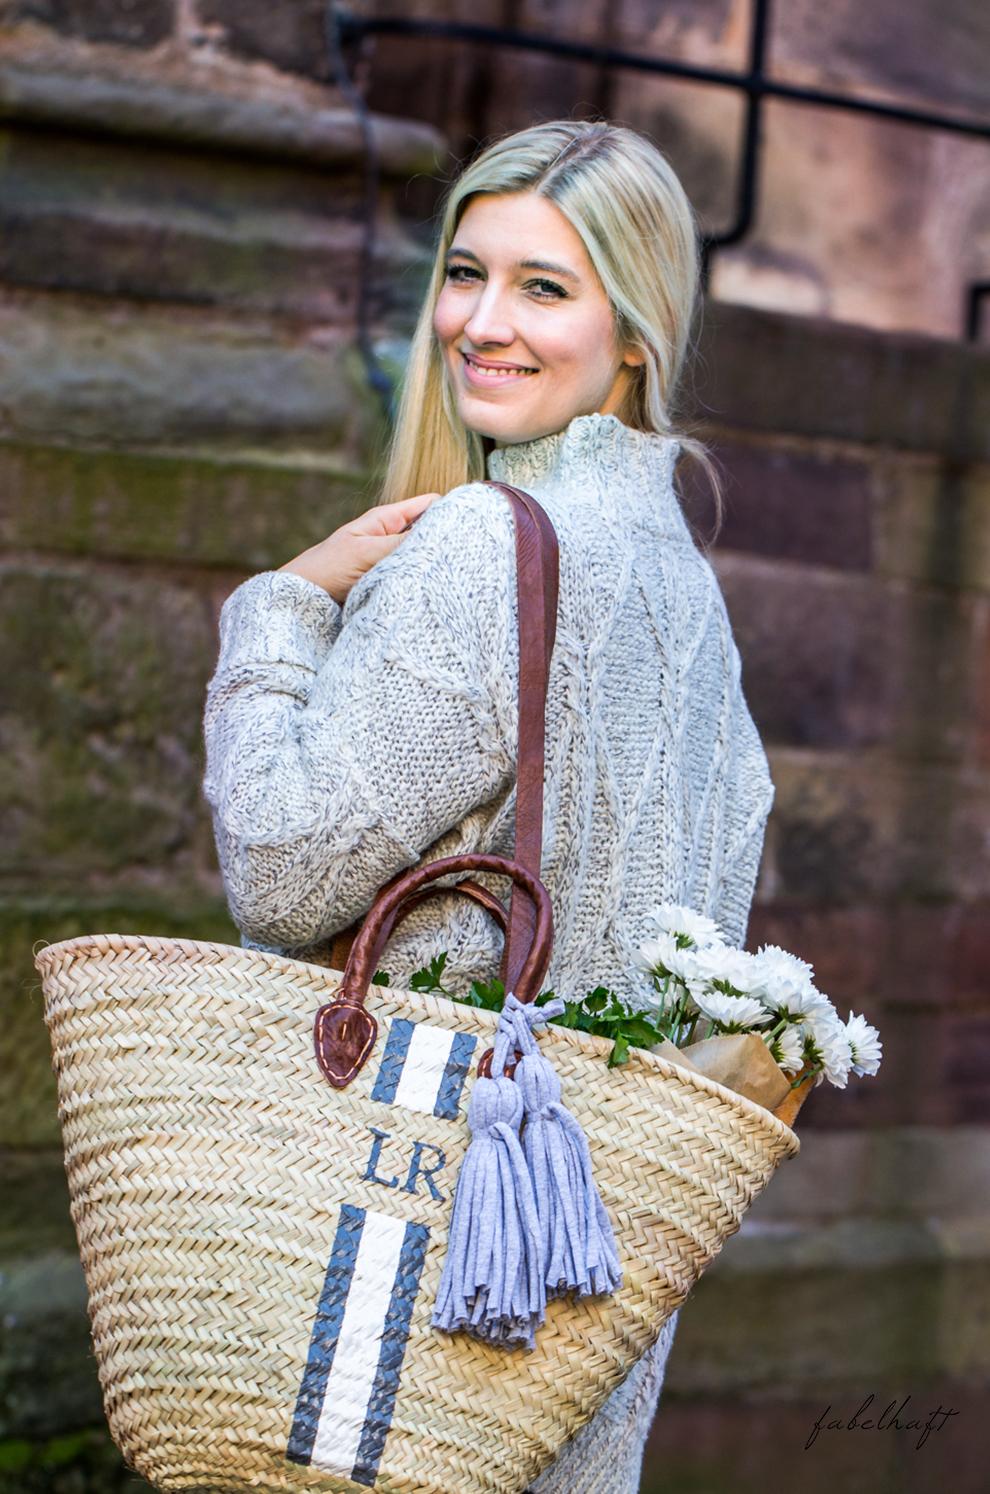 lieblingsstueck-germany-fein-und-fabelhaft-monogram-basket-bastkorb-herbst-outfit-kuschel-pullover-grau-slipper-loafer-2